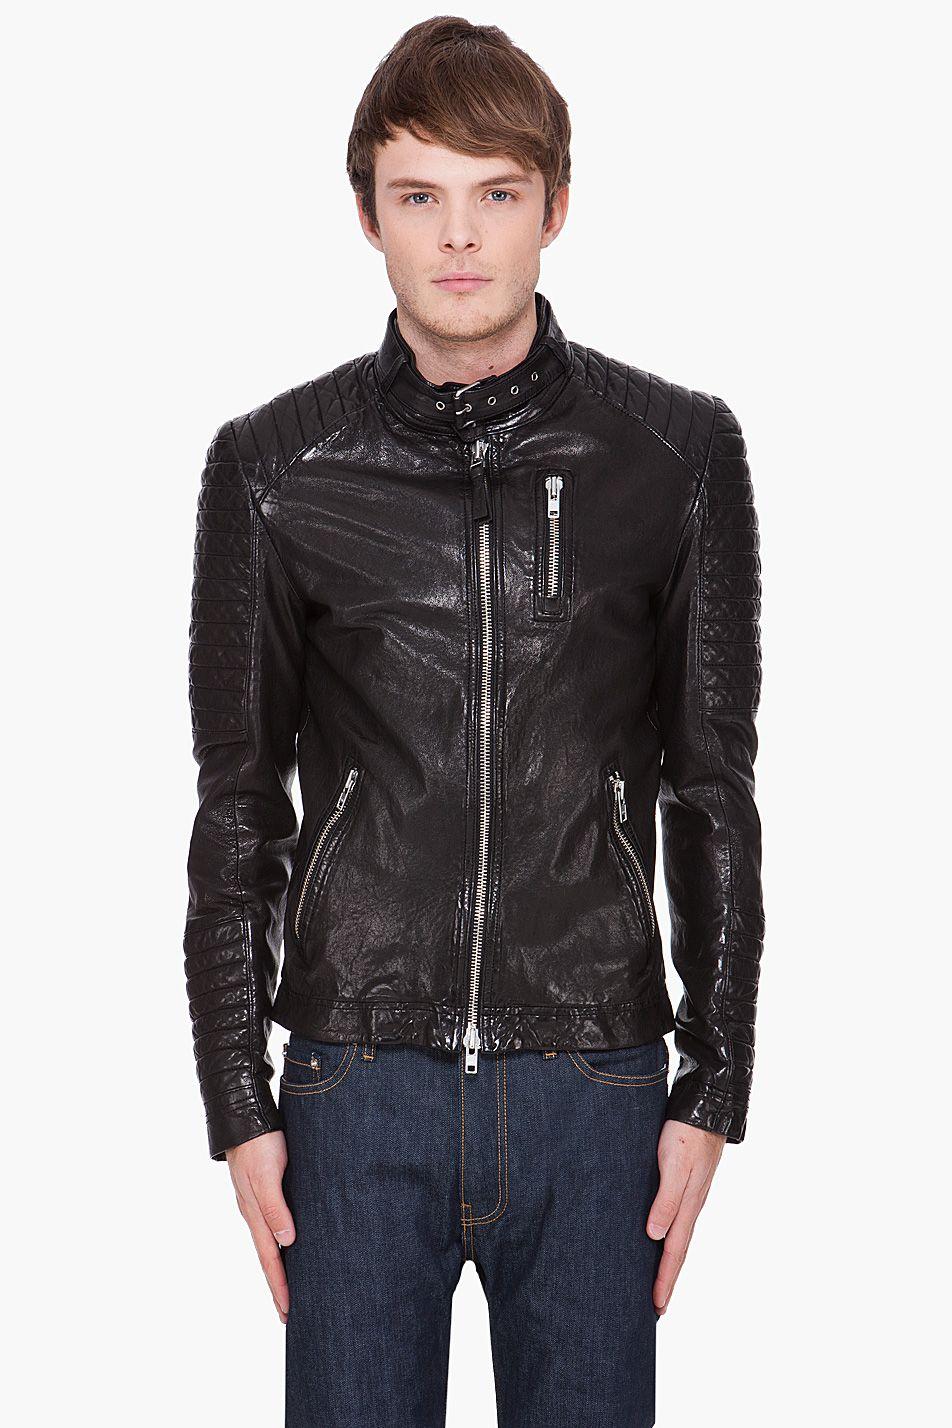 Mackage Clothing For Men Celebrities Leather Jacket Leather Jacket Mackage